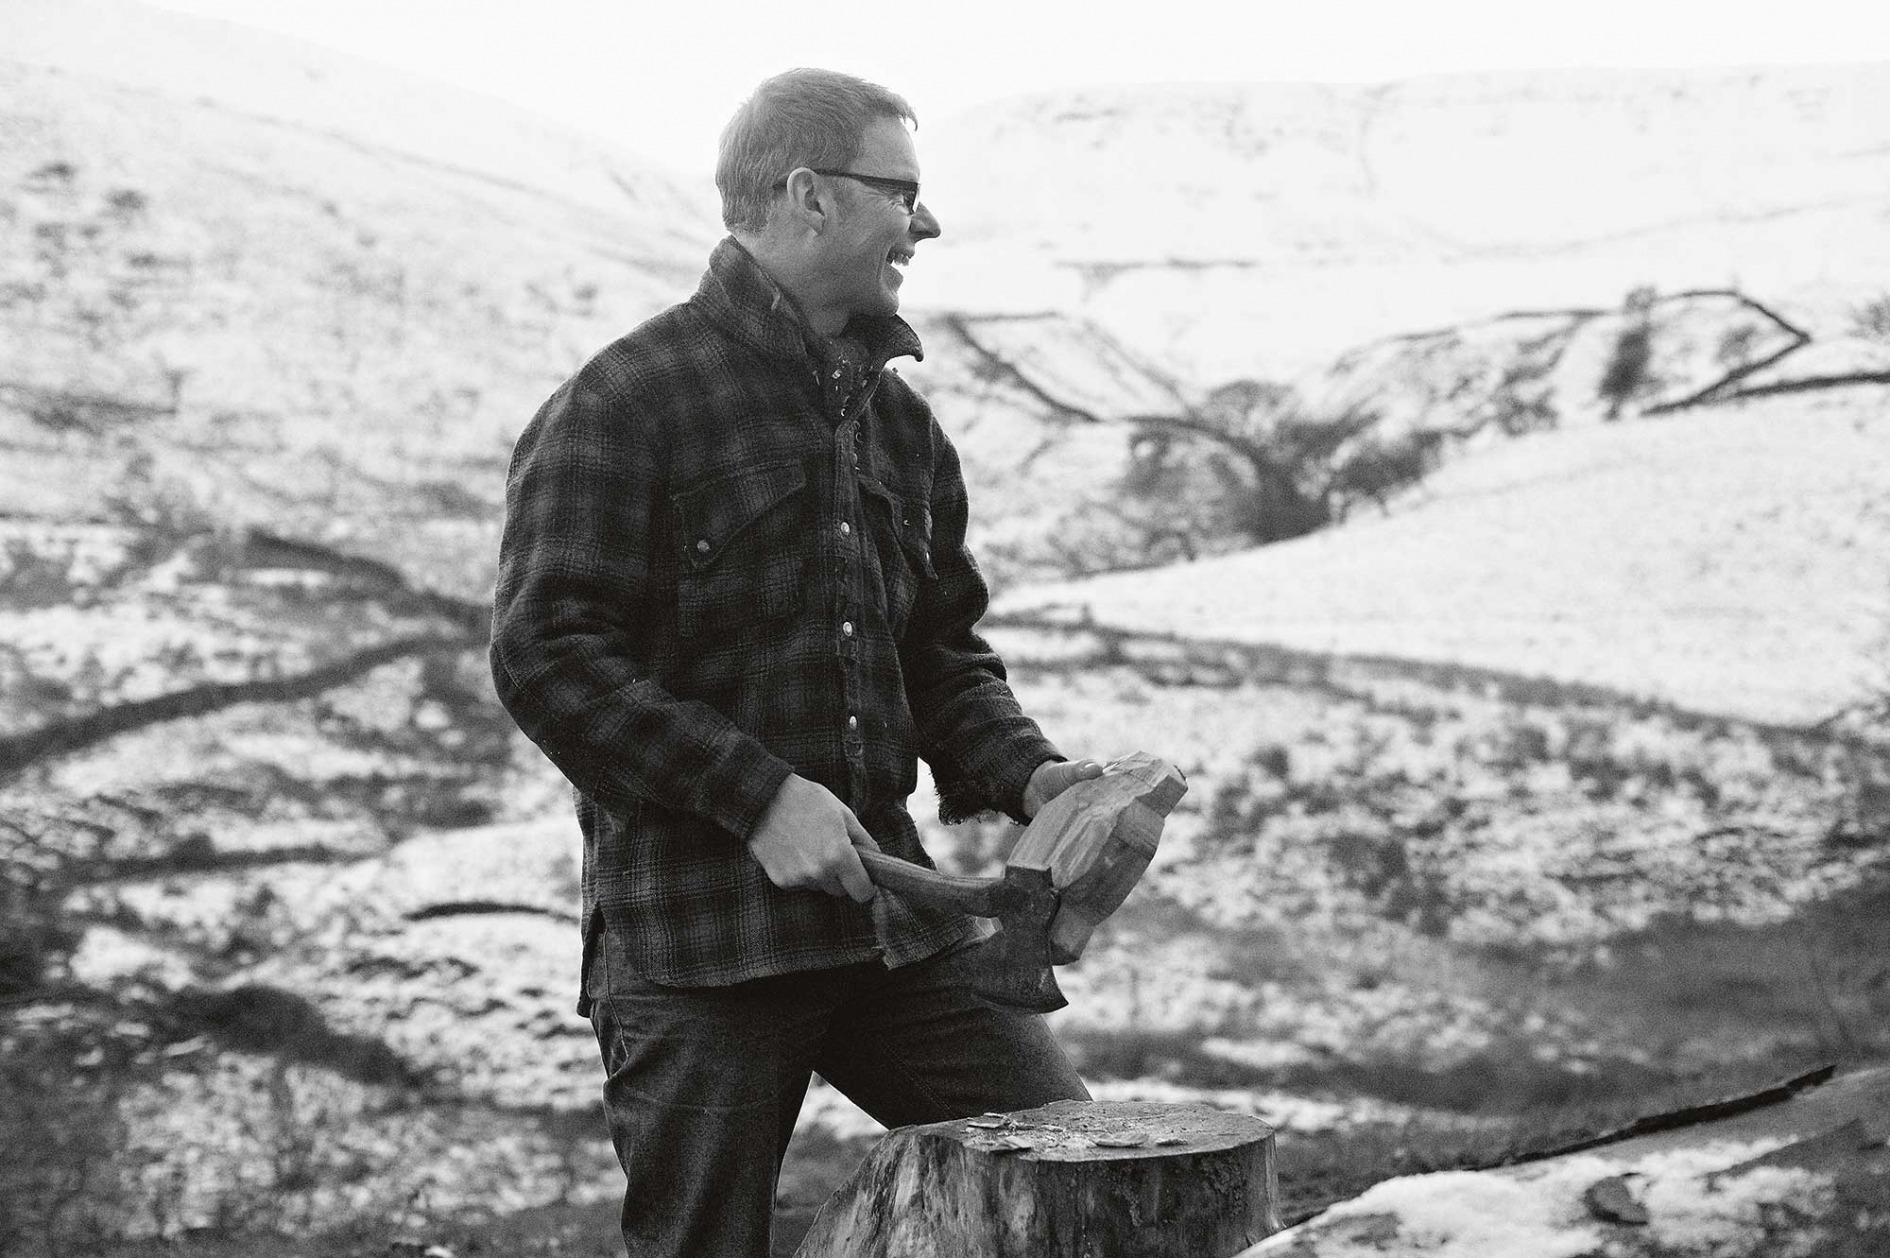 Portrait of Robin Wood outdoors